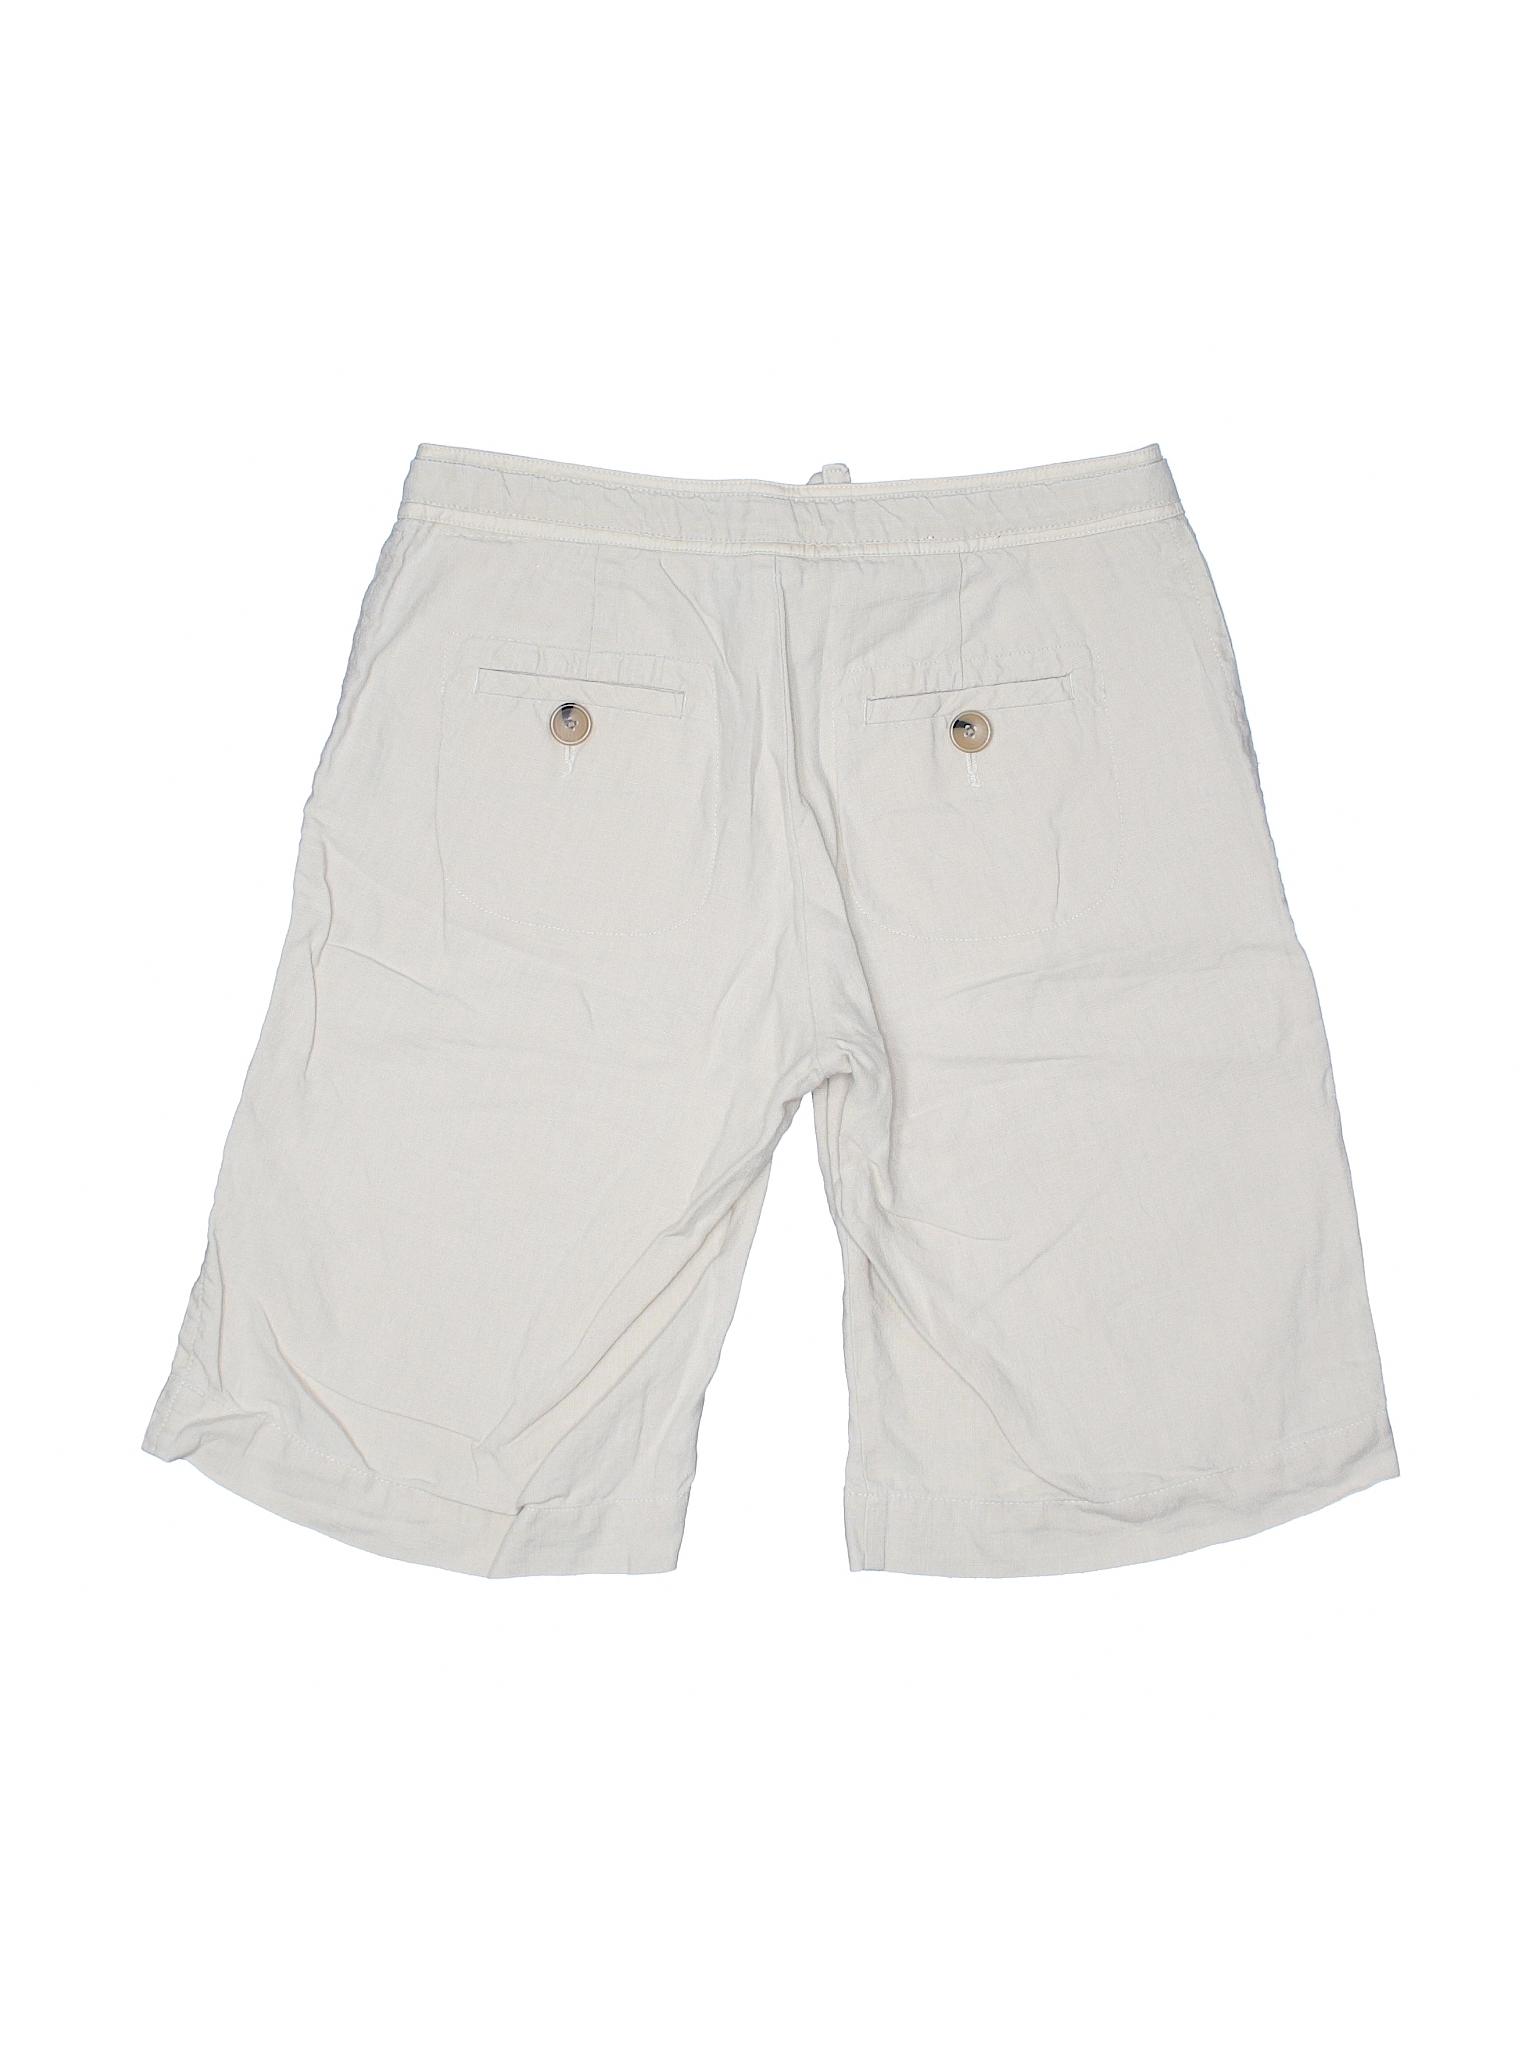 Boutique Khaki Shorts Republic Factory Banana Store vwxqOYva